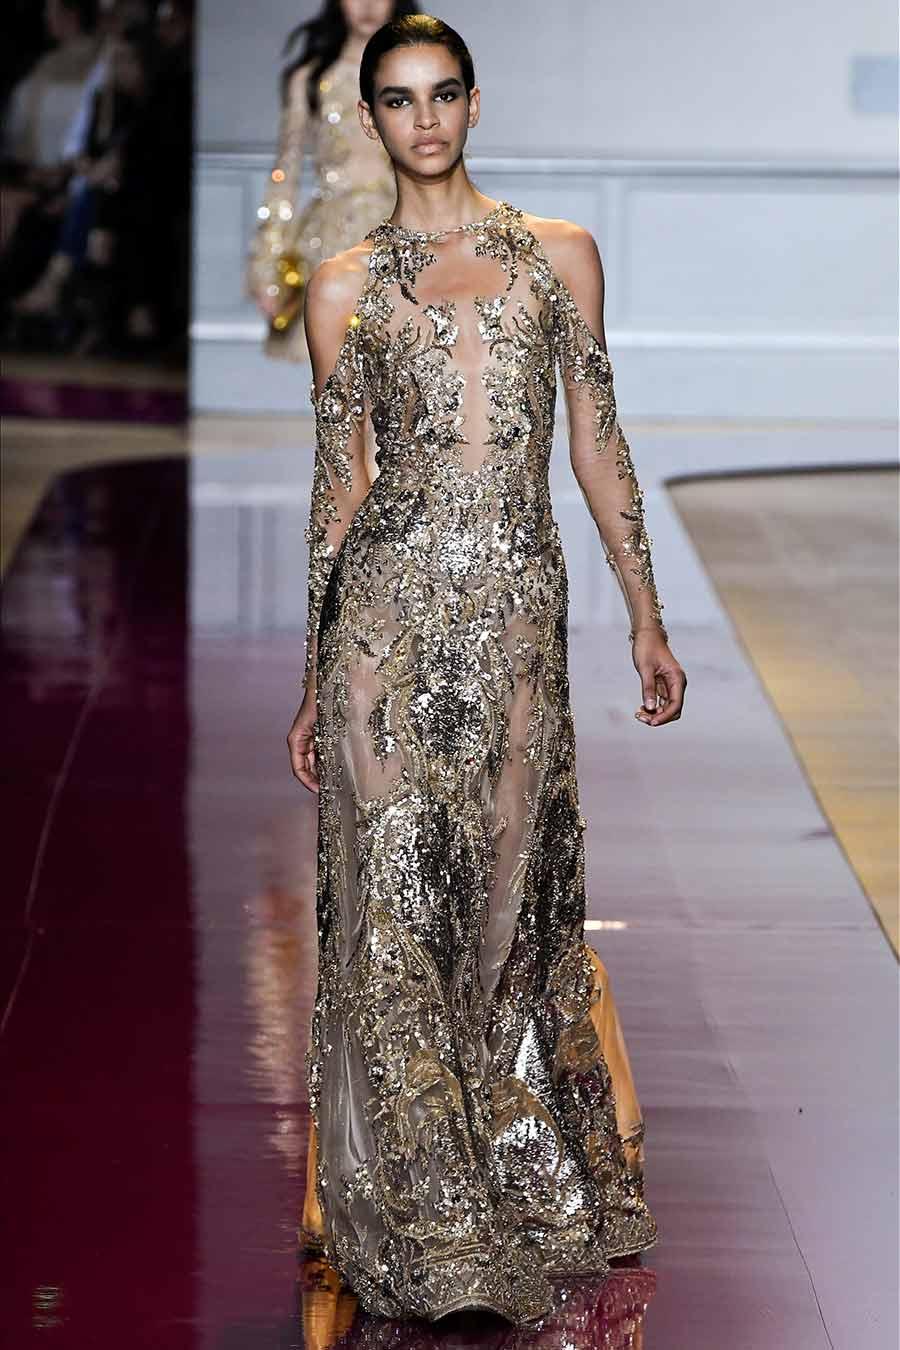 cristalli-look-shining-zuhair-murad-houte-couture-img2